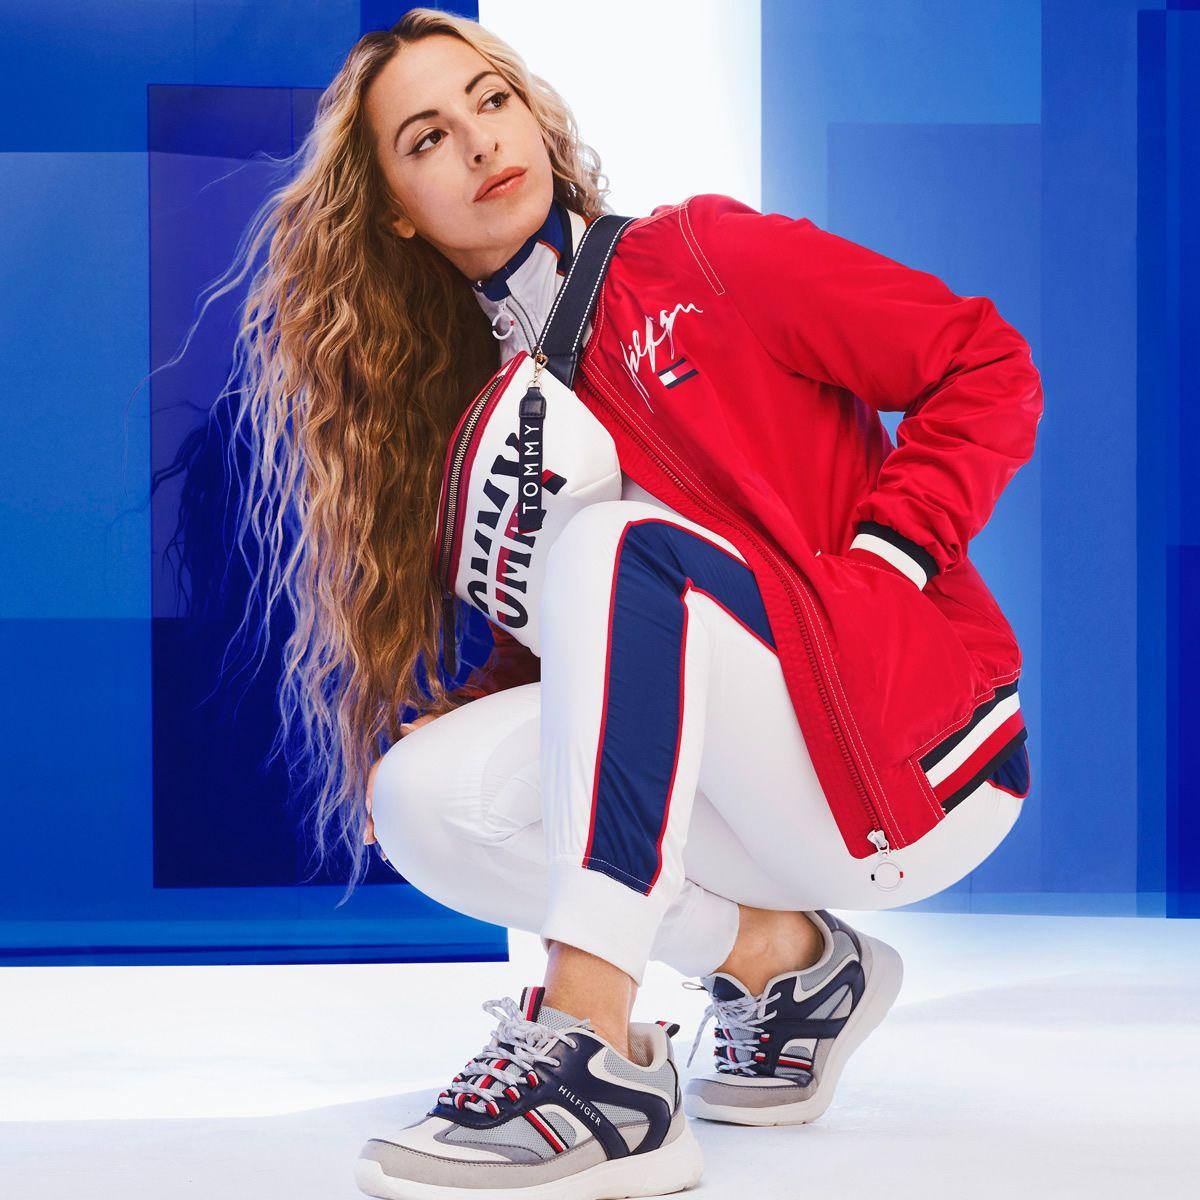 b984305ca7c0b Tommy Hilfiger Clothes - Dresses   Jeans - Macy s